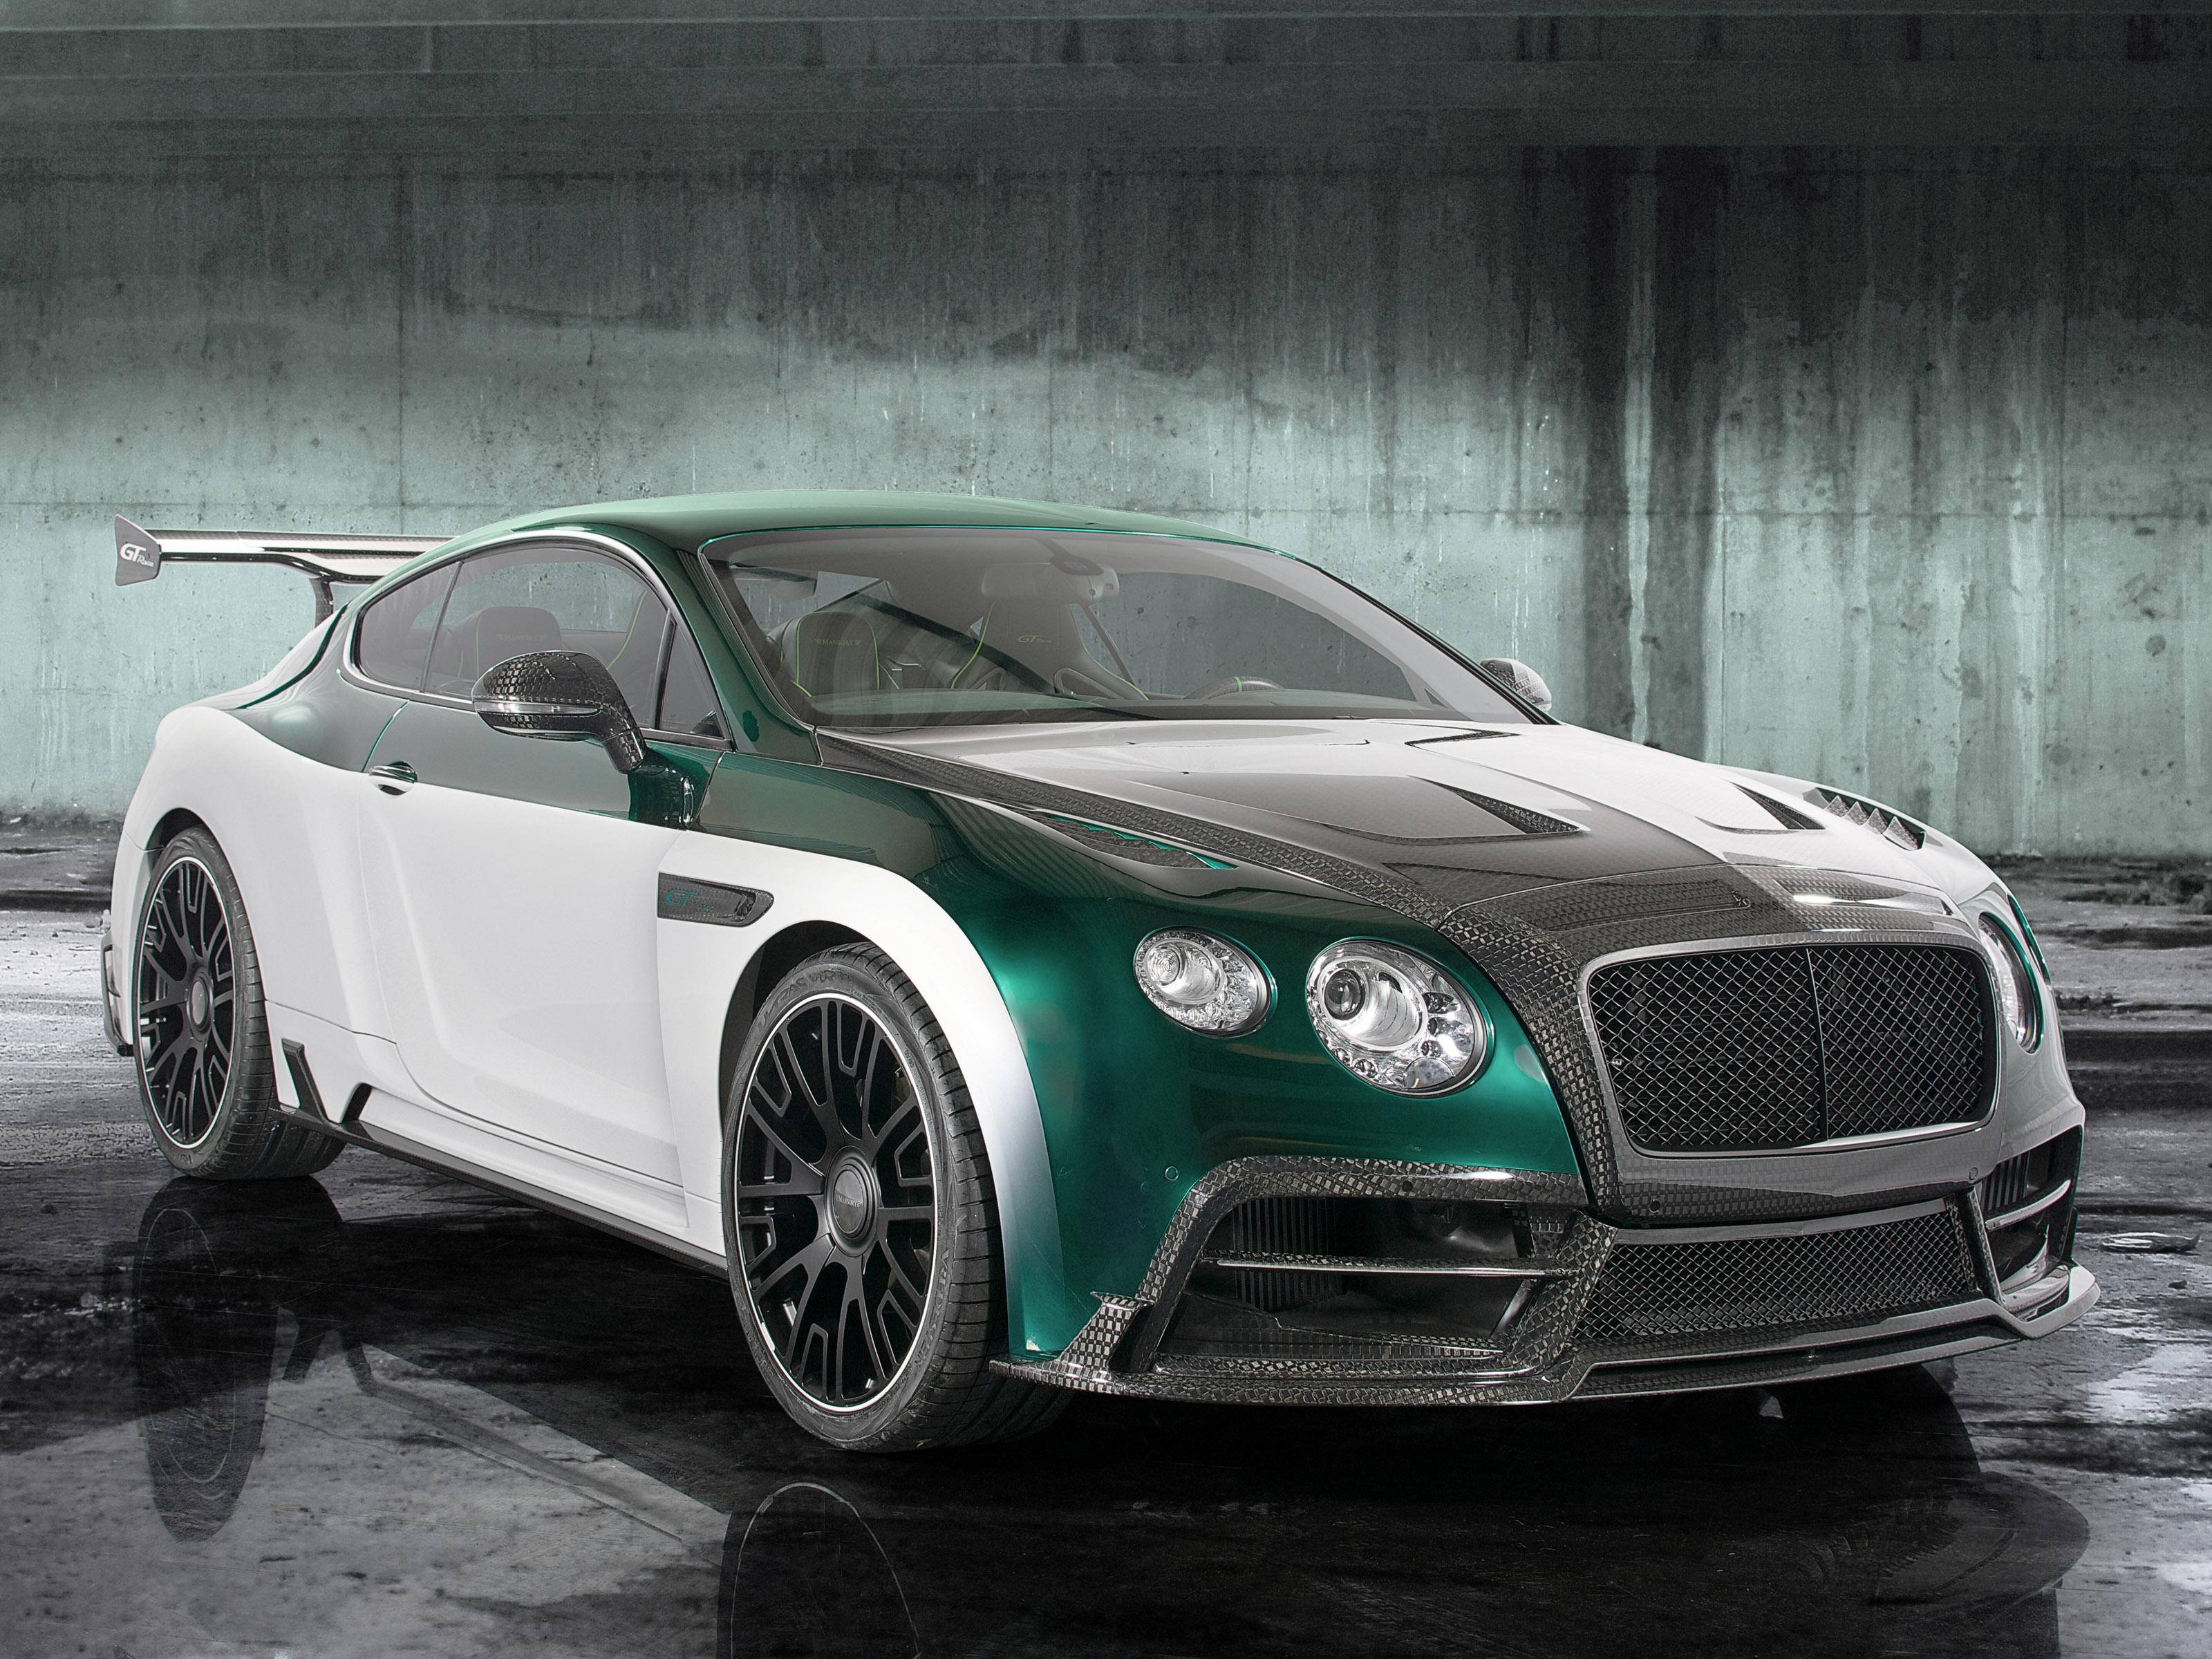 2015 Mansory - Bentley Continental GT Race